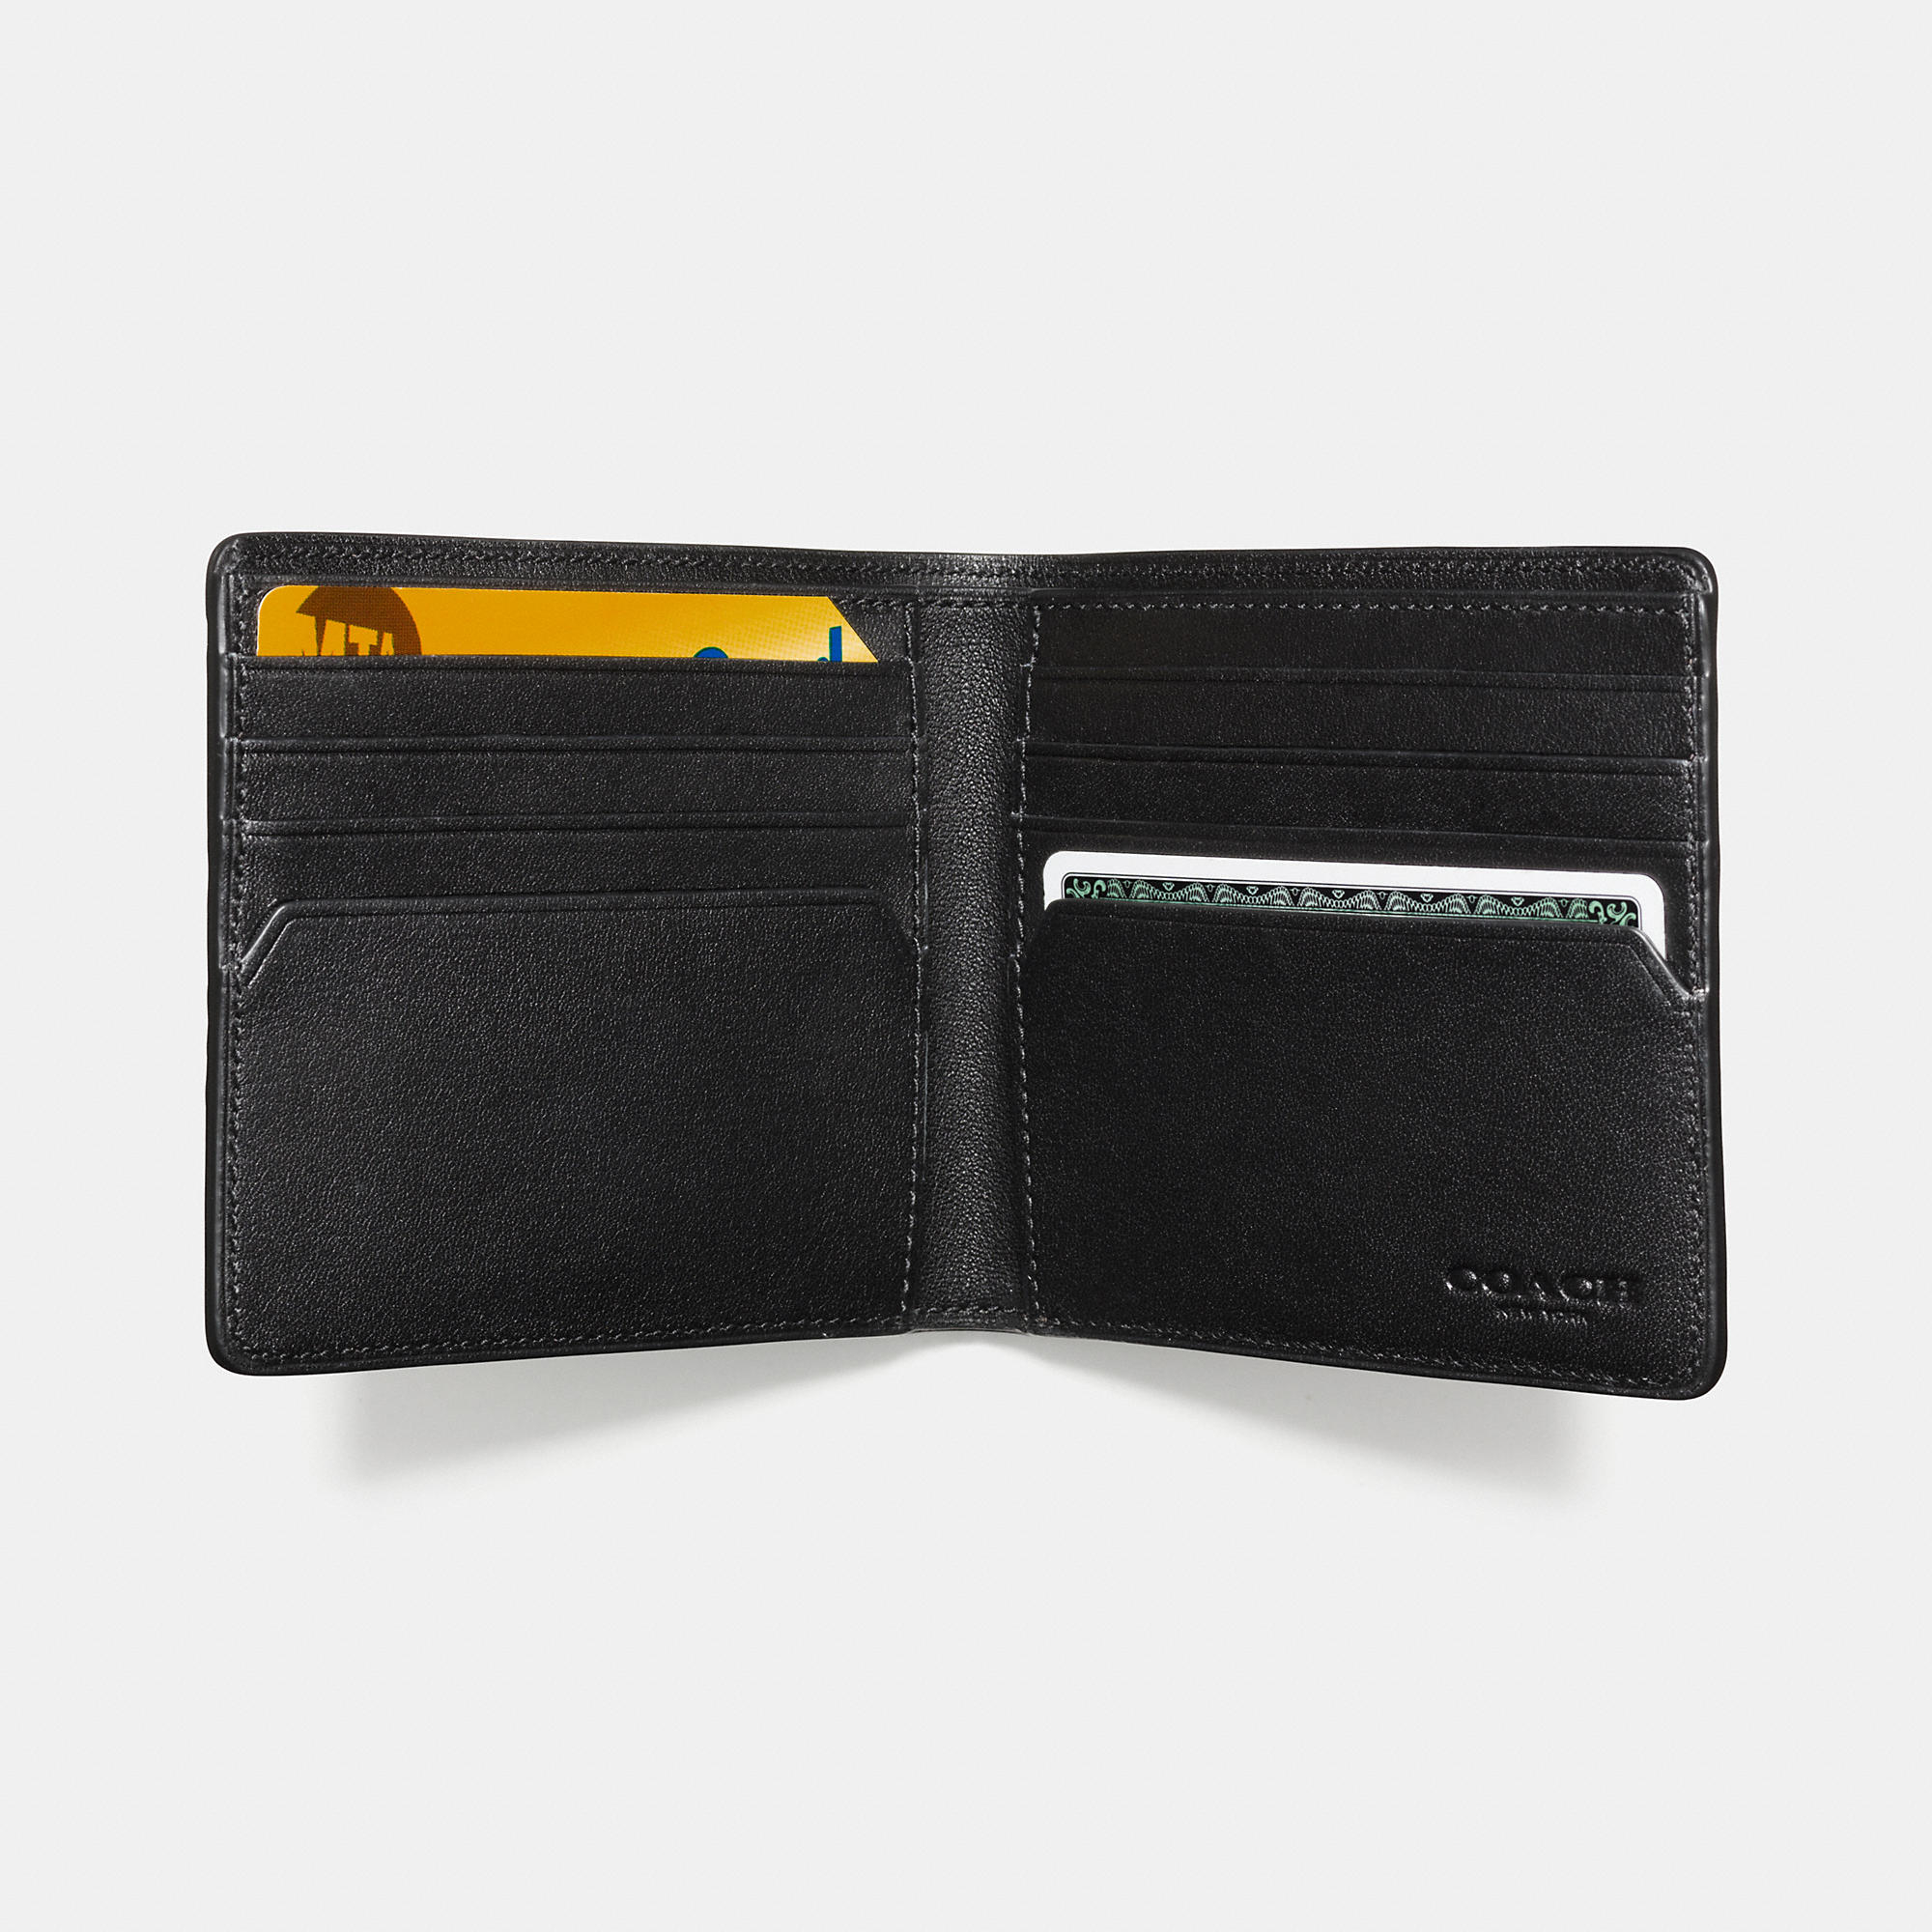 9382709ba0bd new style lyst coach double billfold wallet in signature crossgrain leather  95ca3 7dea8